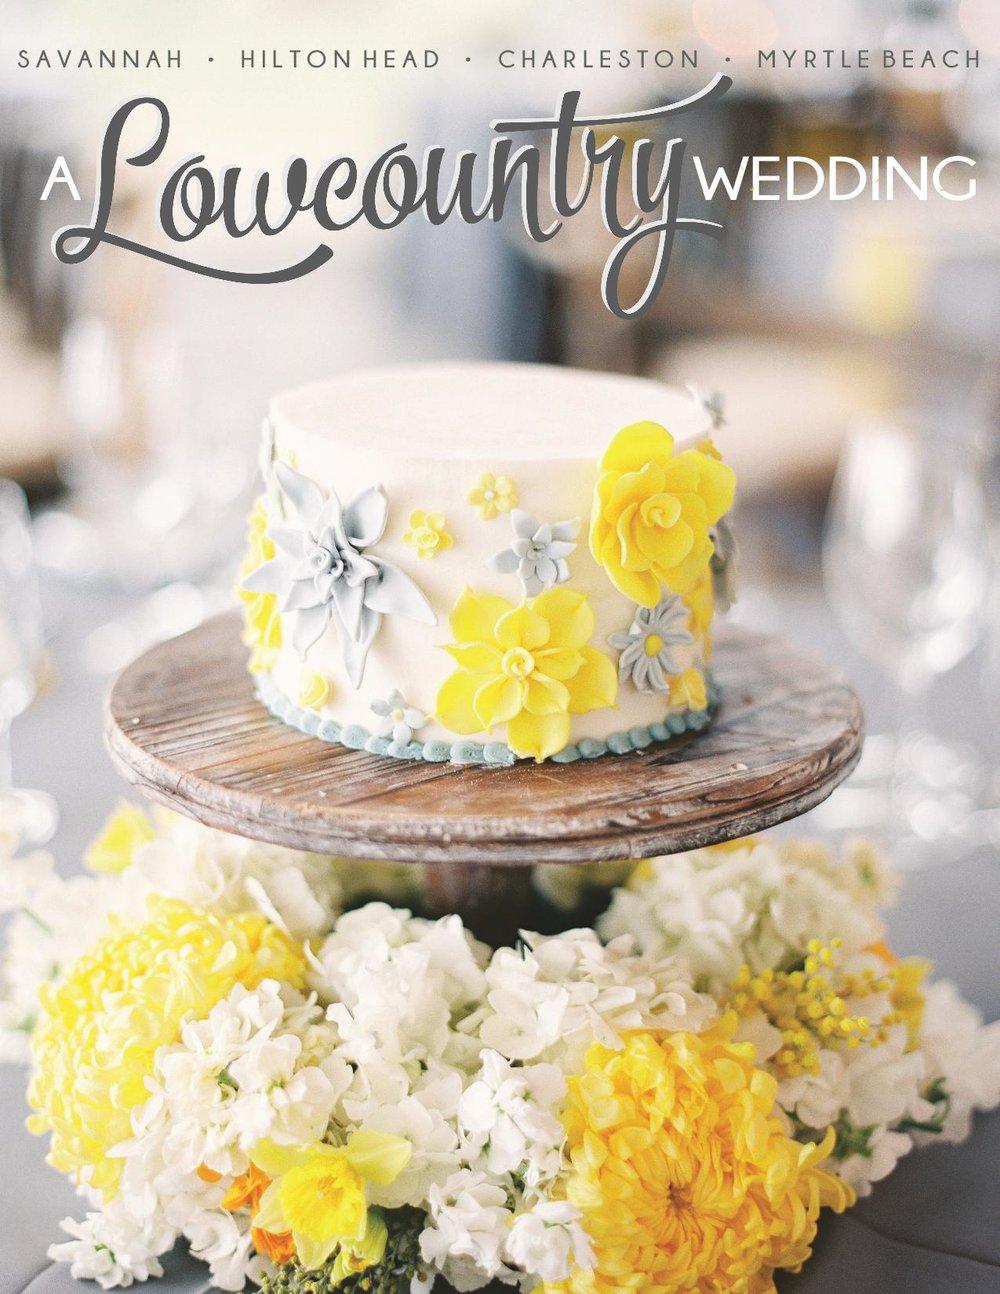 WINTER 2017 - 2ND EDITION — A Lowcountry Wedding Blog & Magazine ...